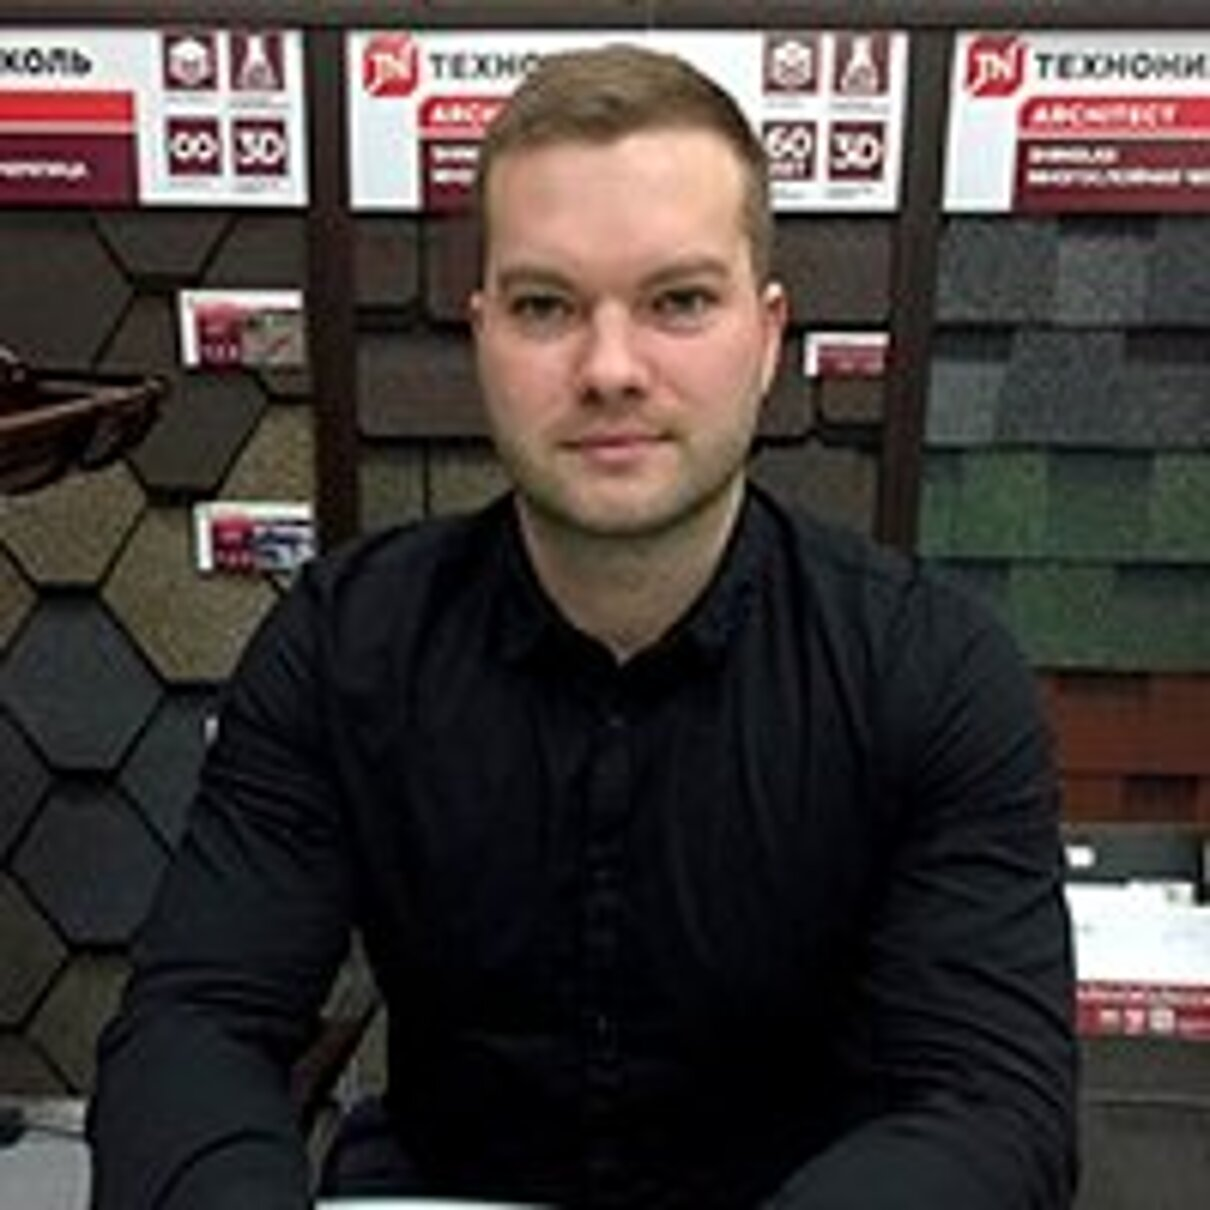 Жалоба-отзыв: Кирилл Змановский - Мошенник.  Фото №1